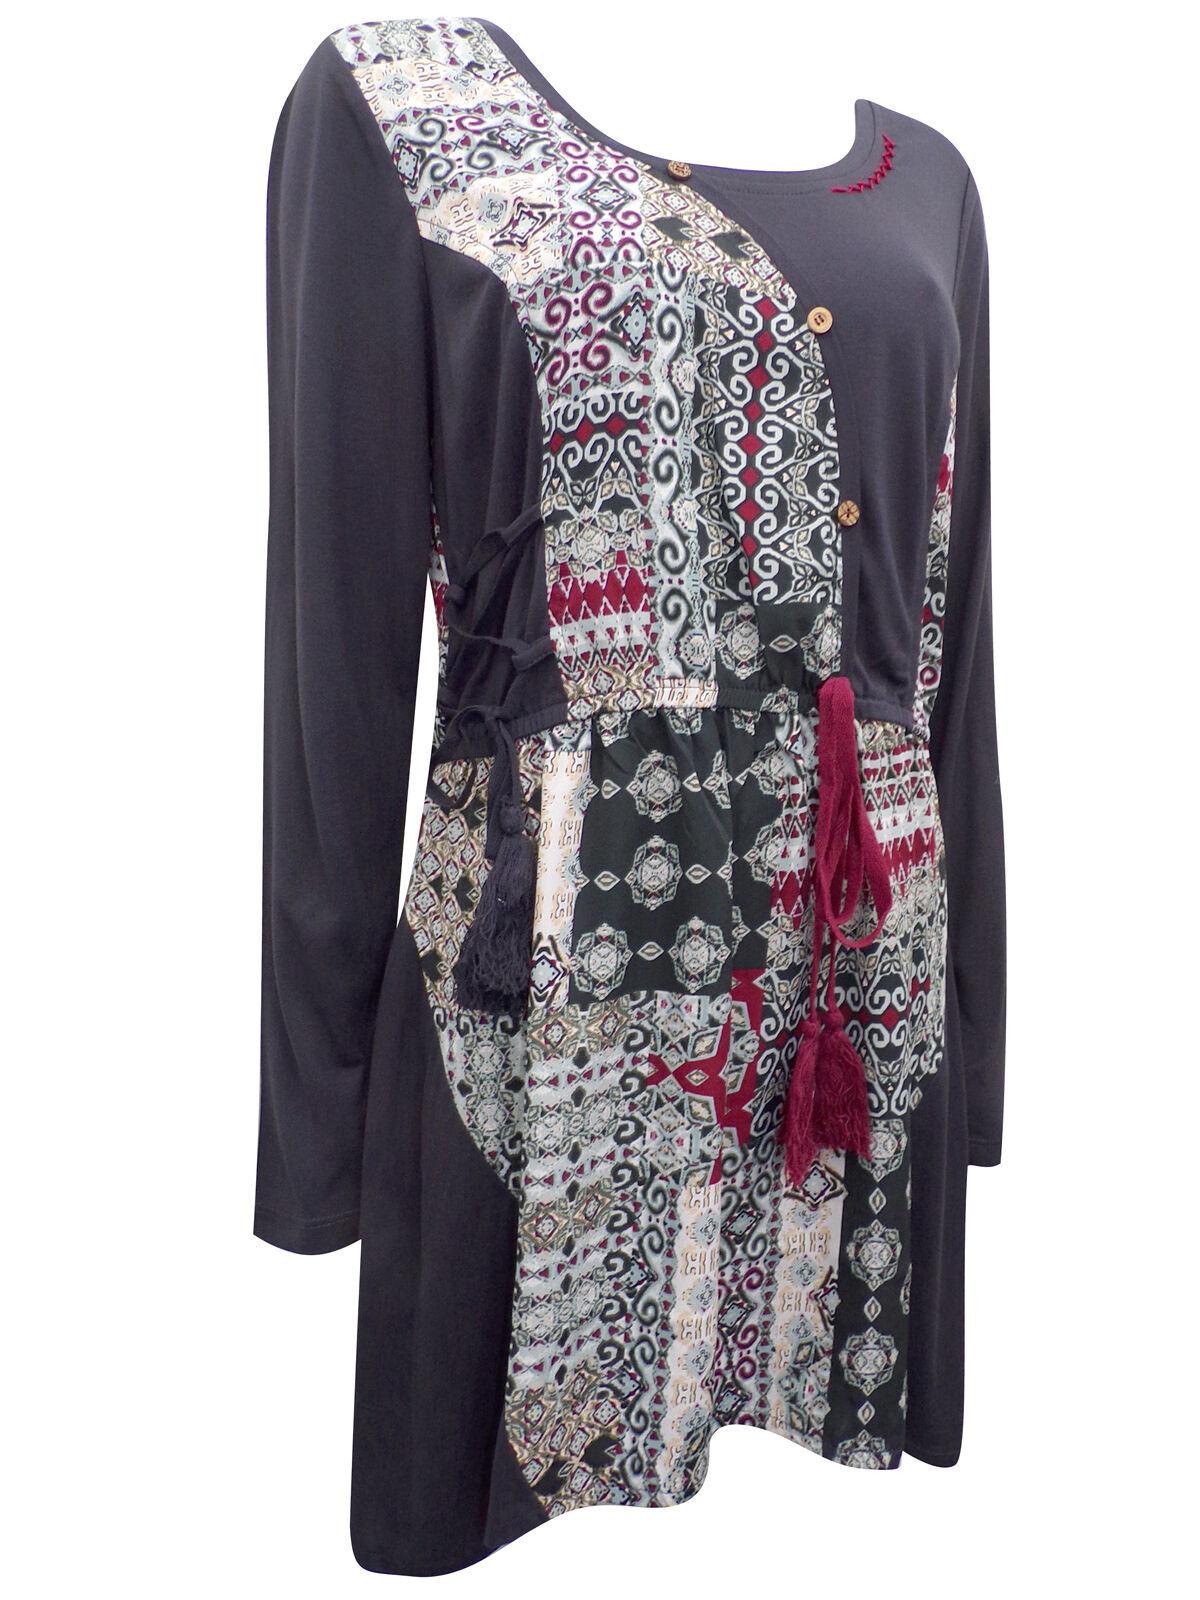 e3b277ff96af3e AboutWe The Free People Women Sleeveless Tee Tropical Combo Size Medium NWT  OB560847